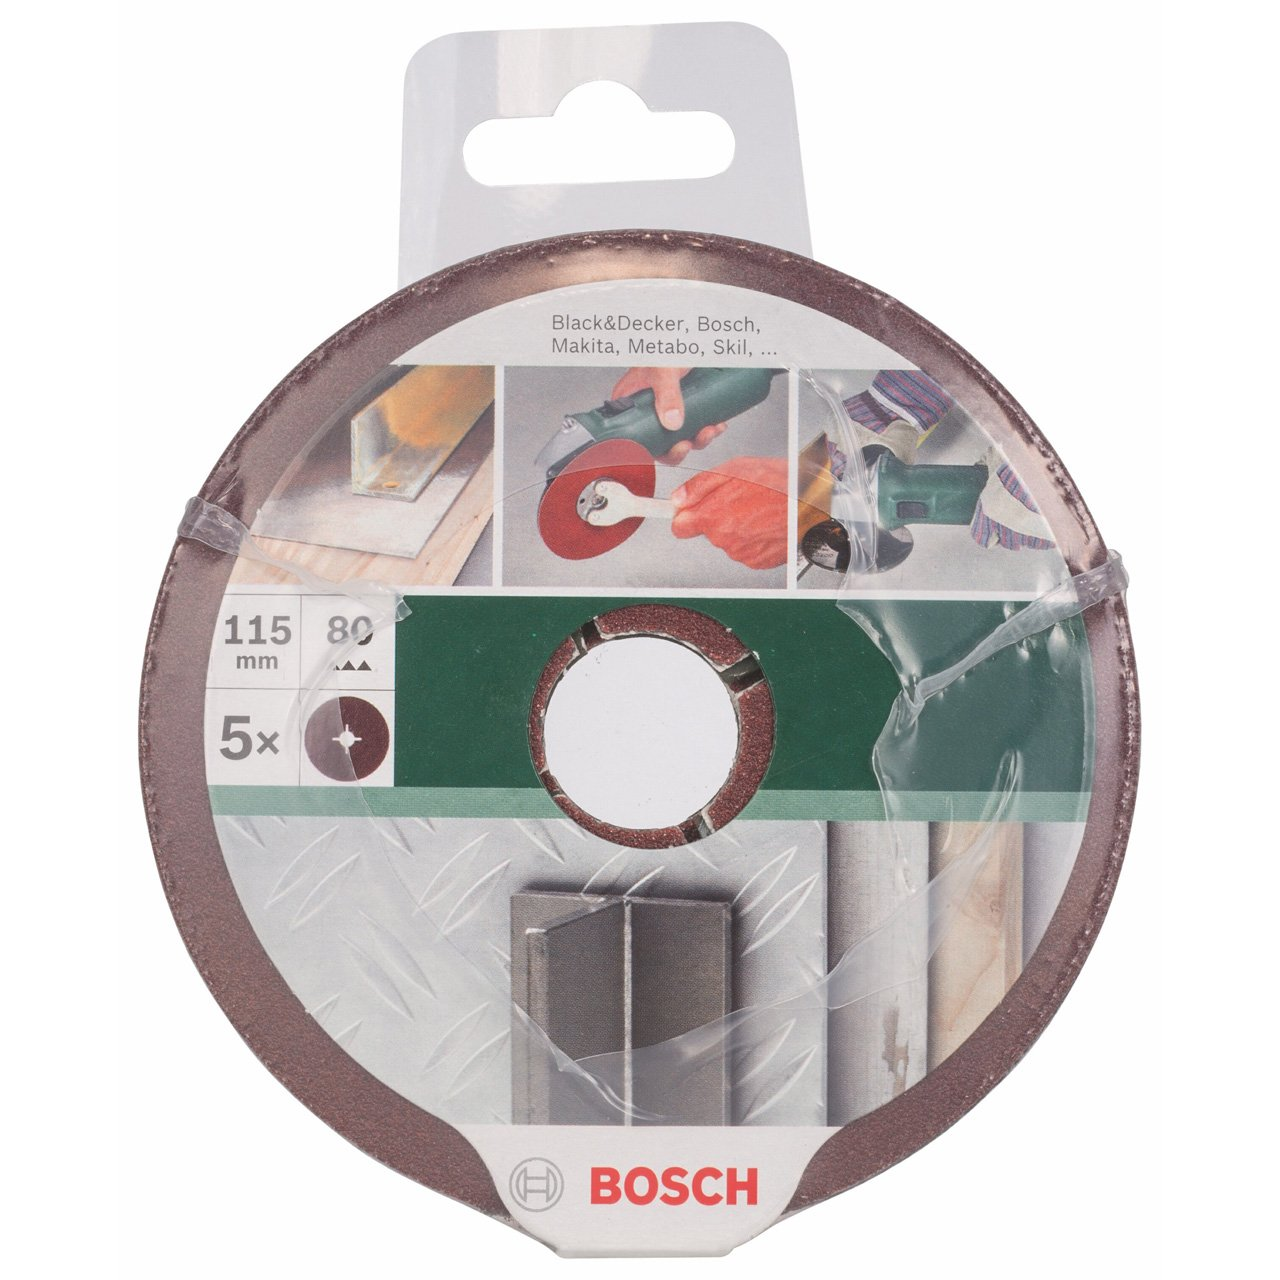 Bosch 2609256243 Marr/ón granulaci/ón: 80 Muela de fibra 115mm